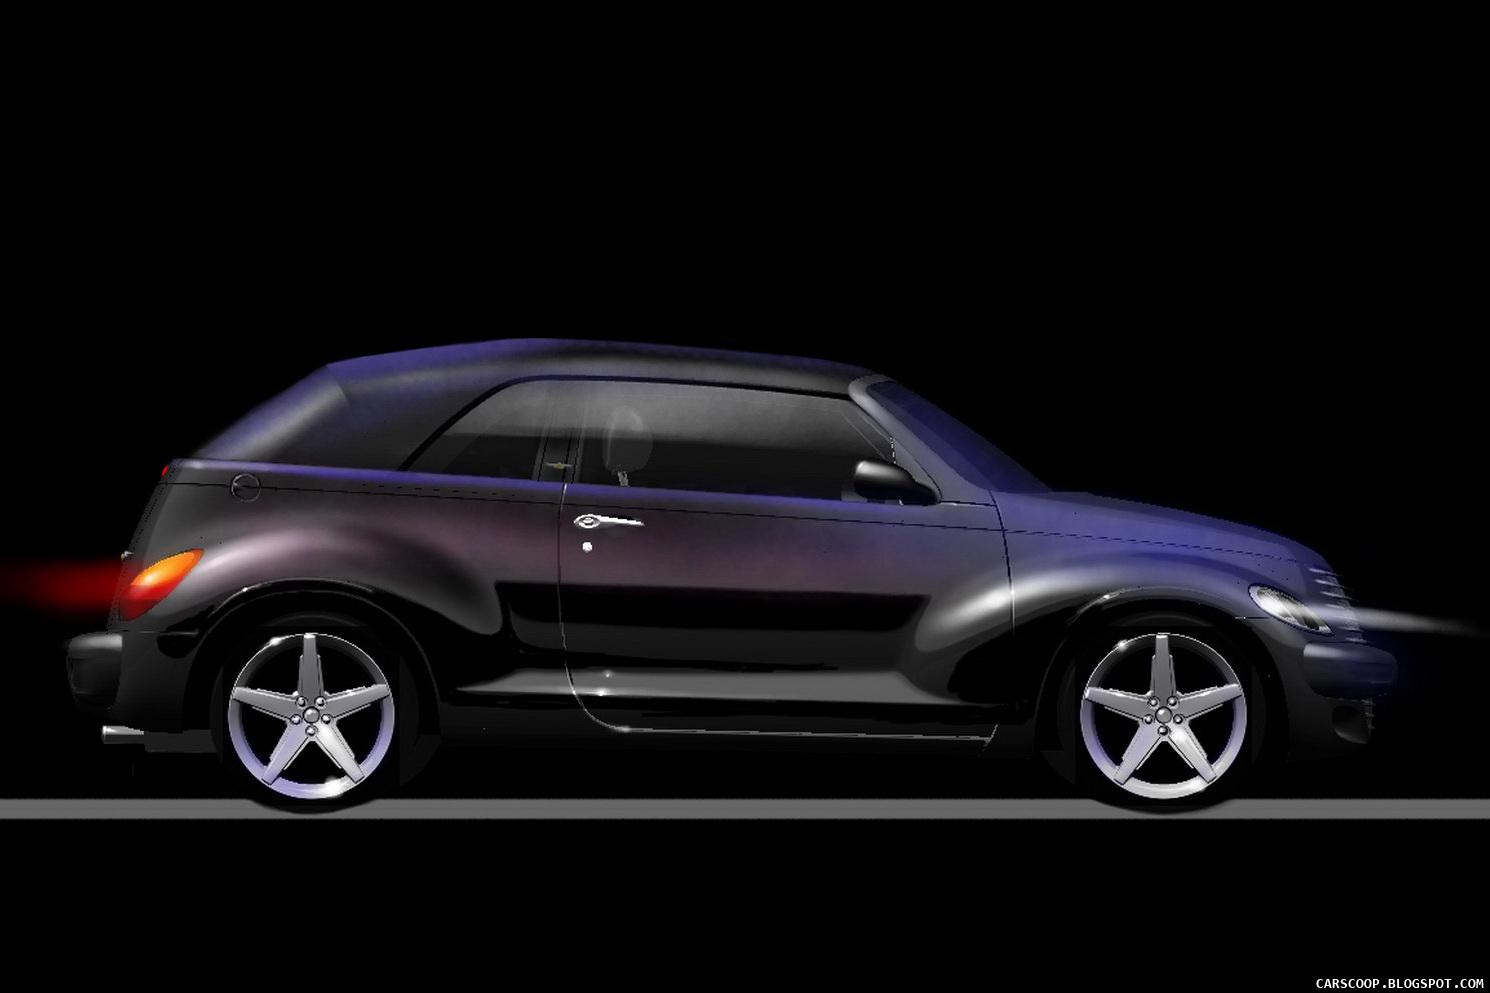 2016 chrysler 300 srt8 price hellcat 2016 2017 new cars. Black Bedroom Furniture Sets. Home Design Ideas